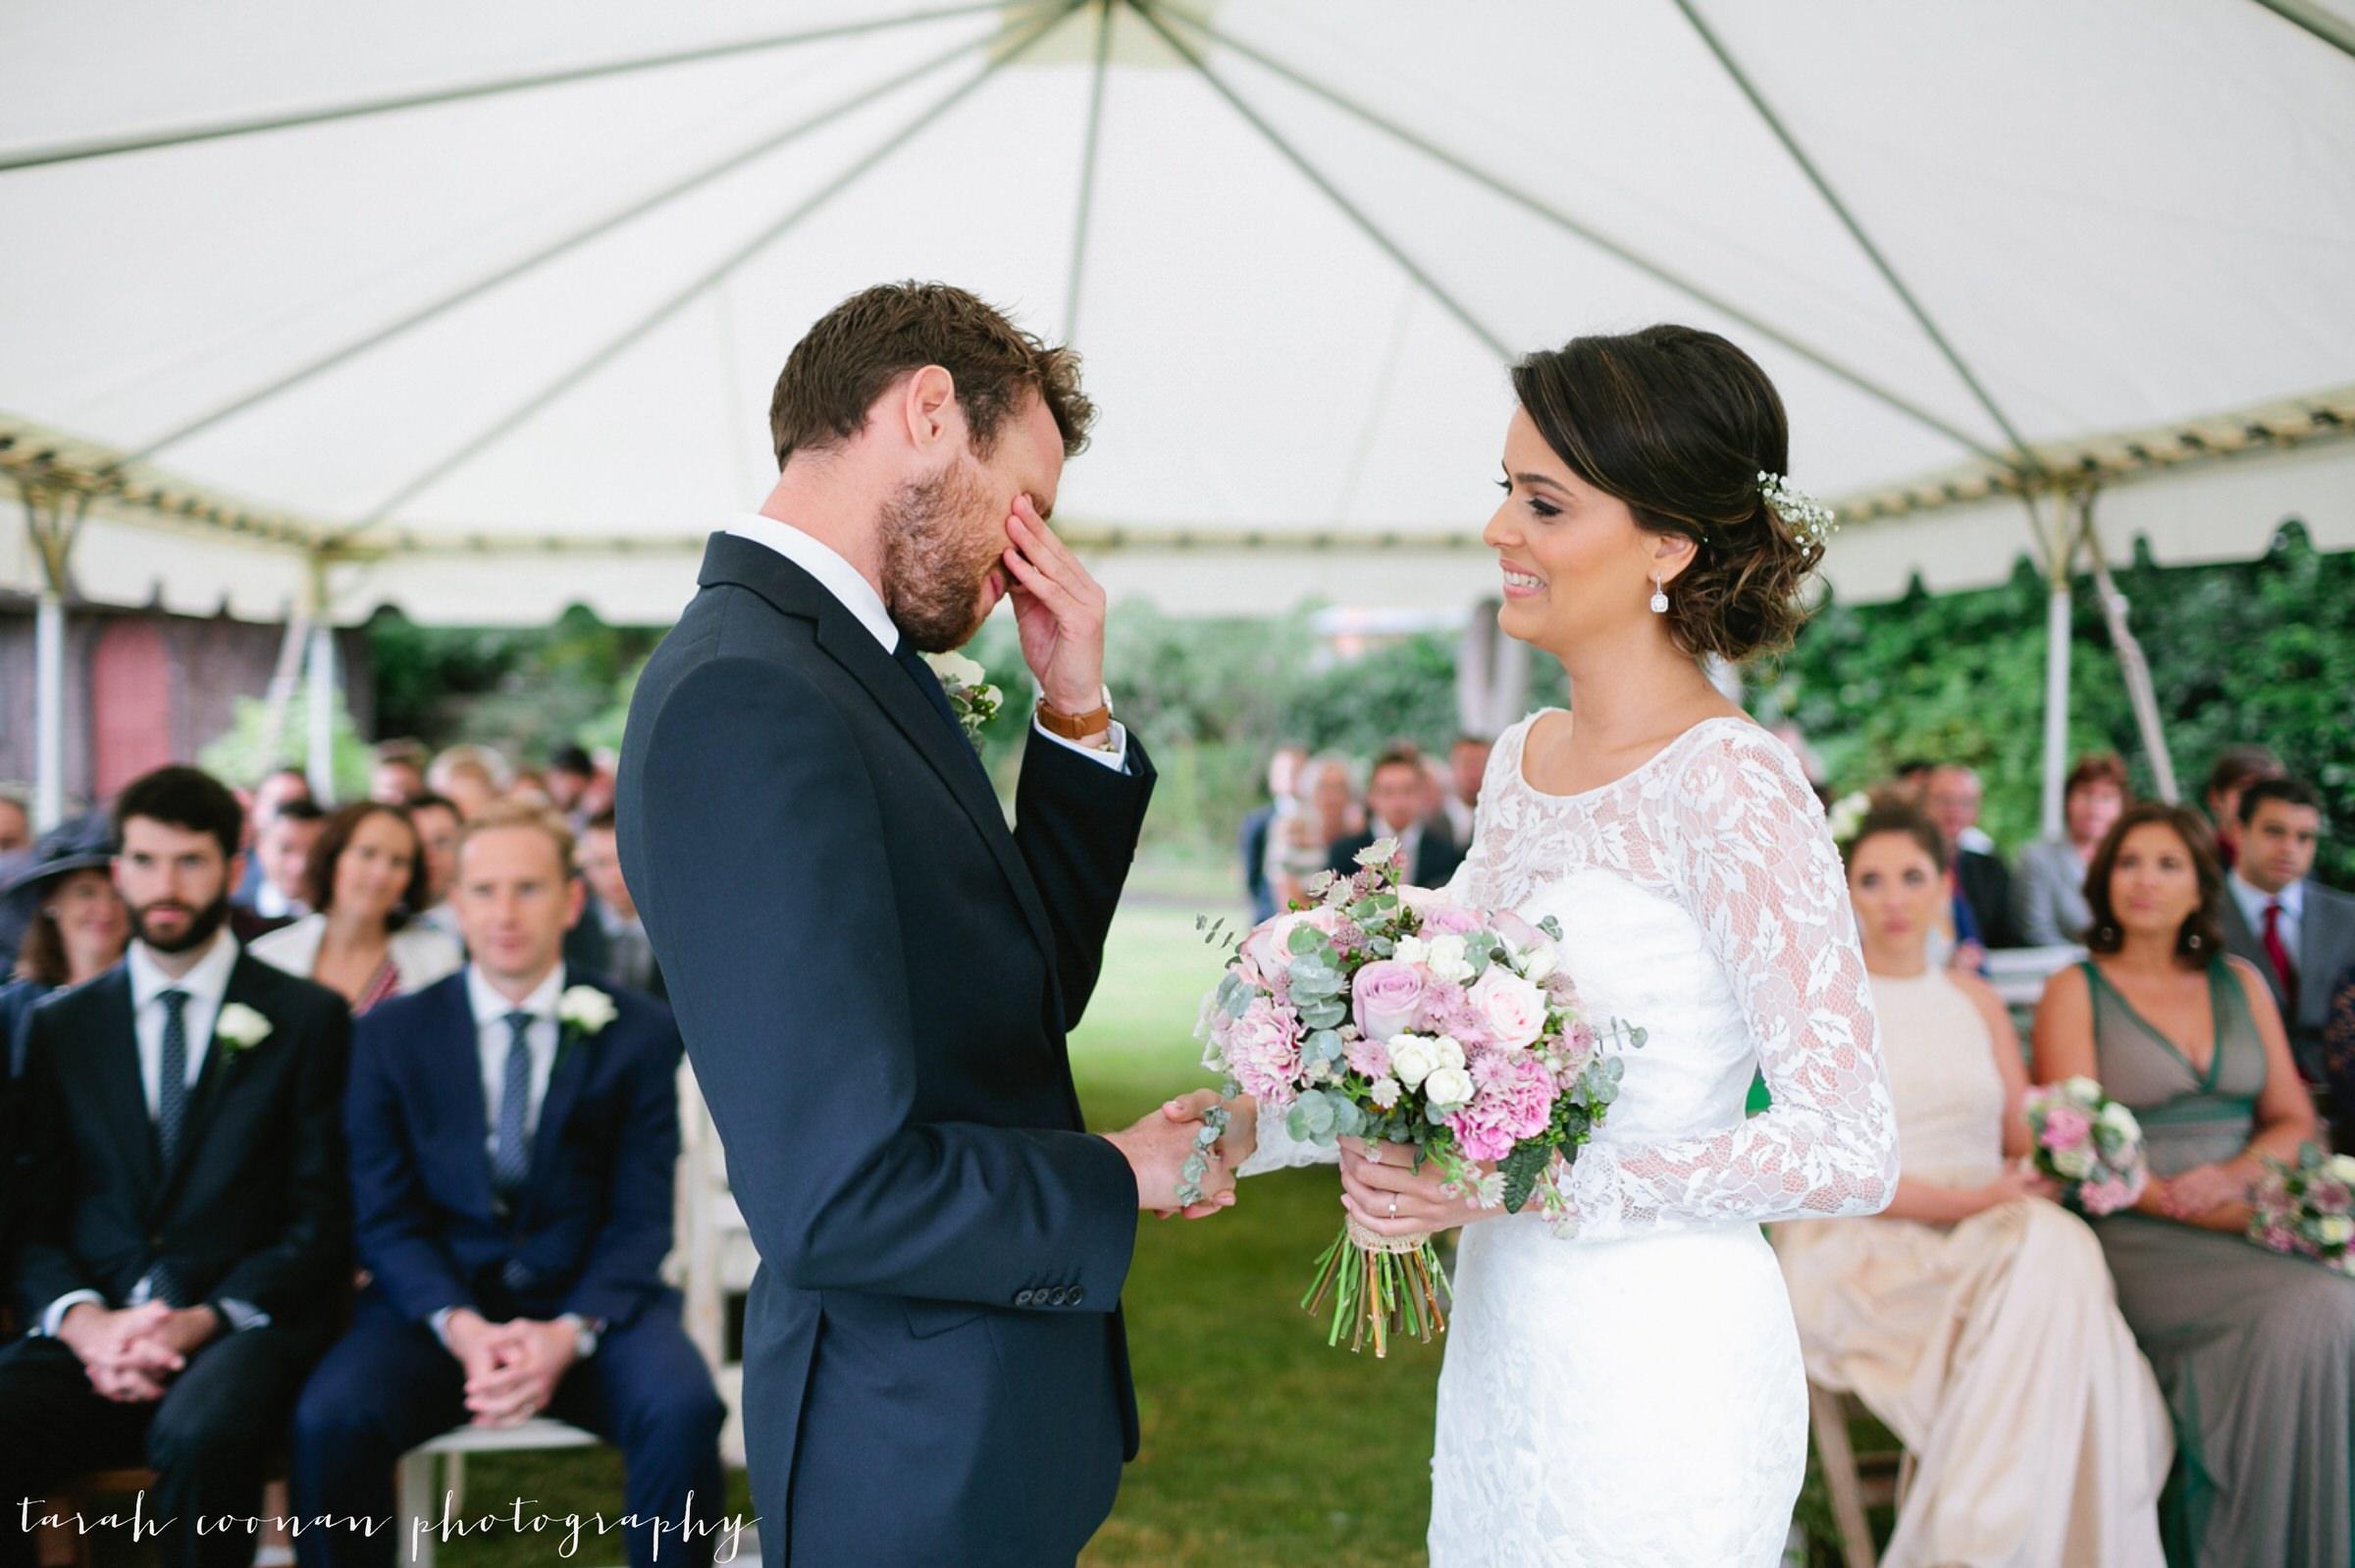 brighton-wedding-photographer26